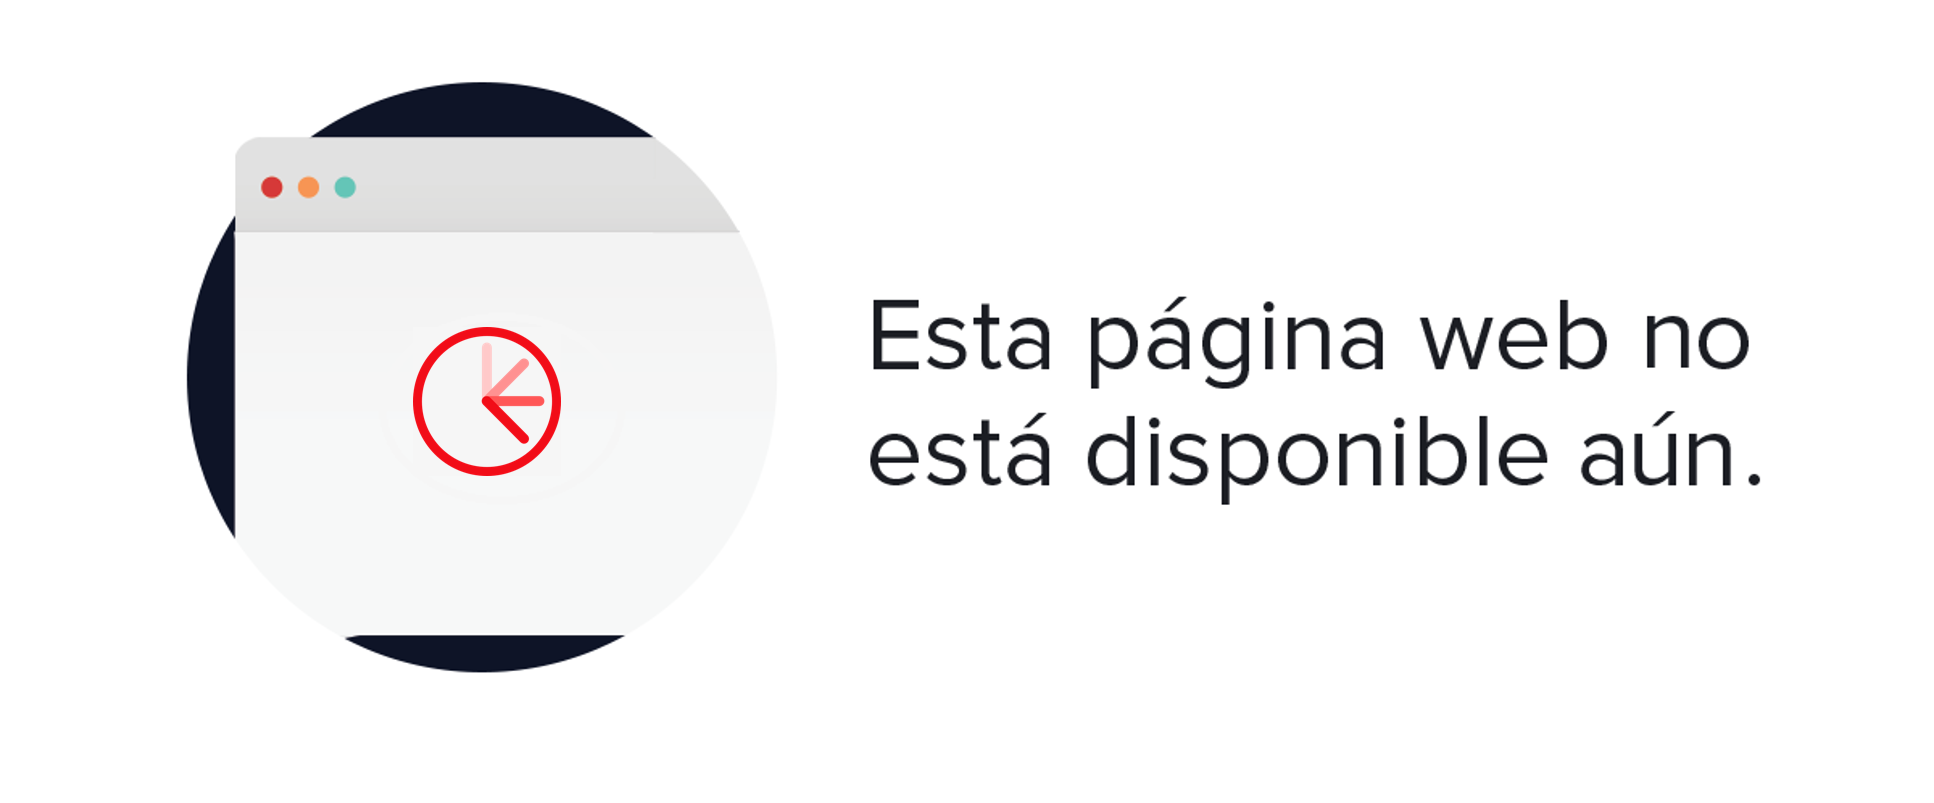 2016 Zapatillas Vans Hombre - Azul Online   c78f18a7222